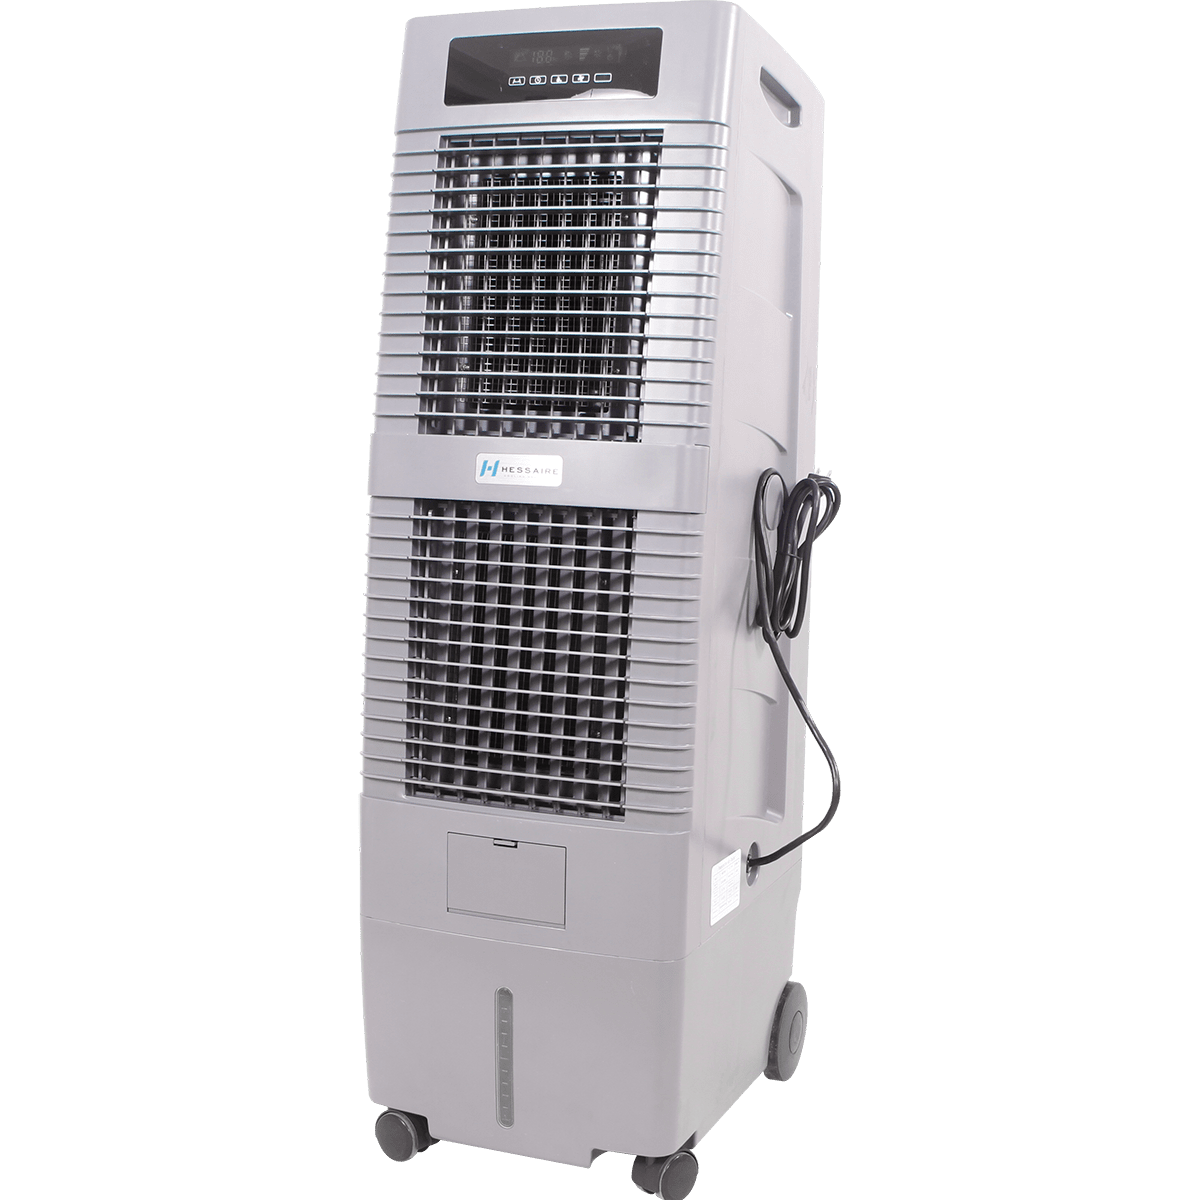 Hessaire MC21A 11,000 CFM Evaporative Cooler he6349